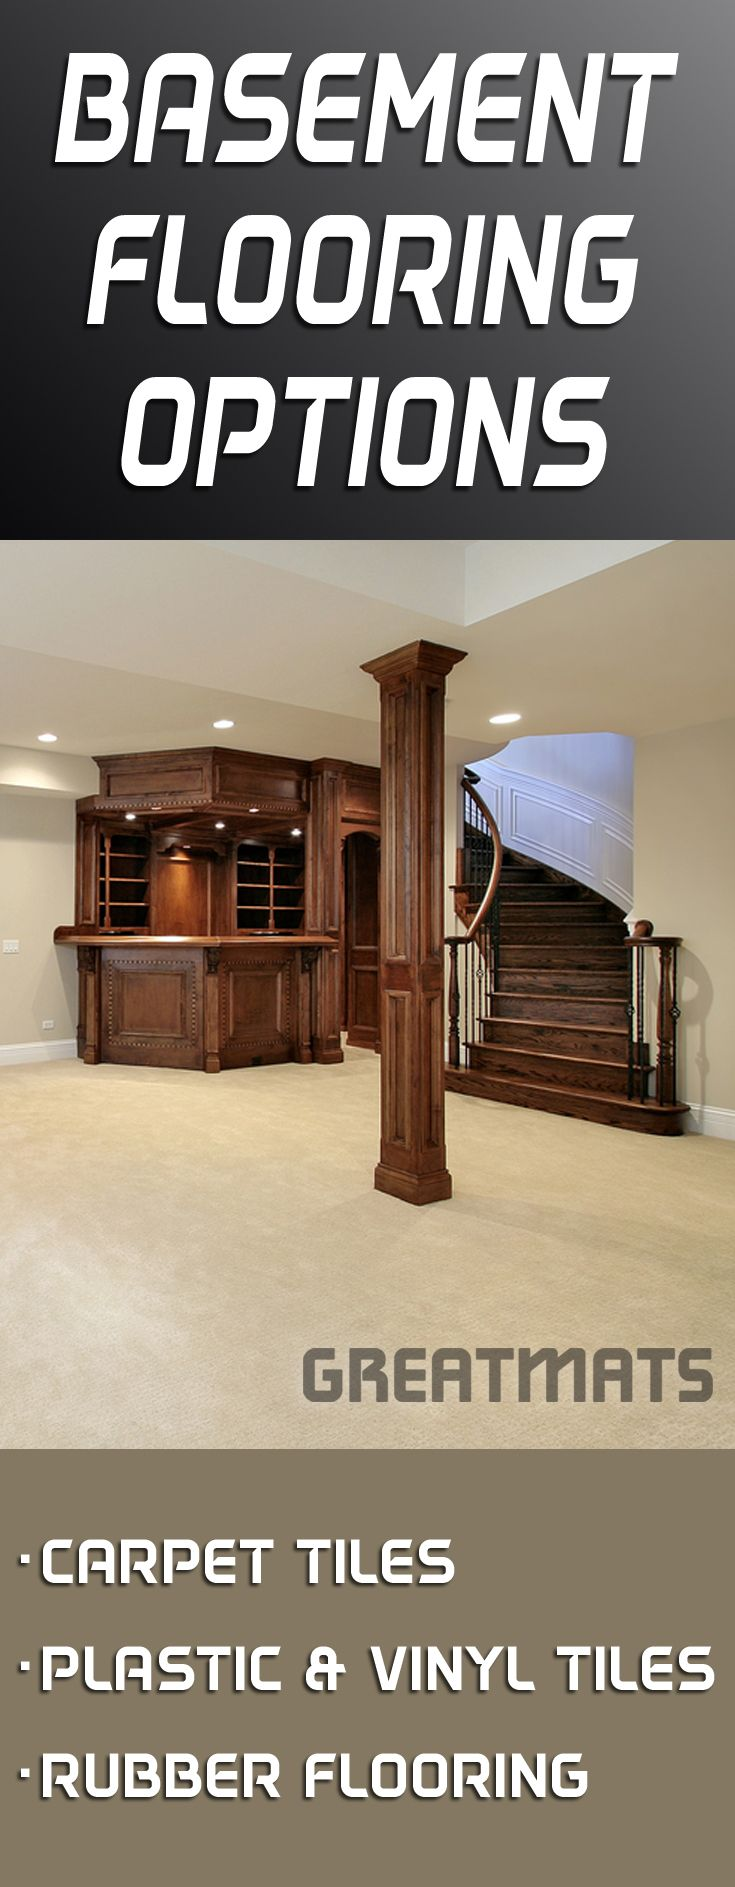 Rubber floor mats for basement - Find A Large Selection Of Basement Flooring Options At Greatmats Com